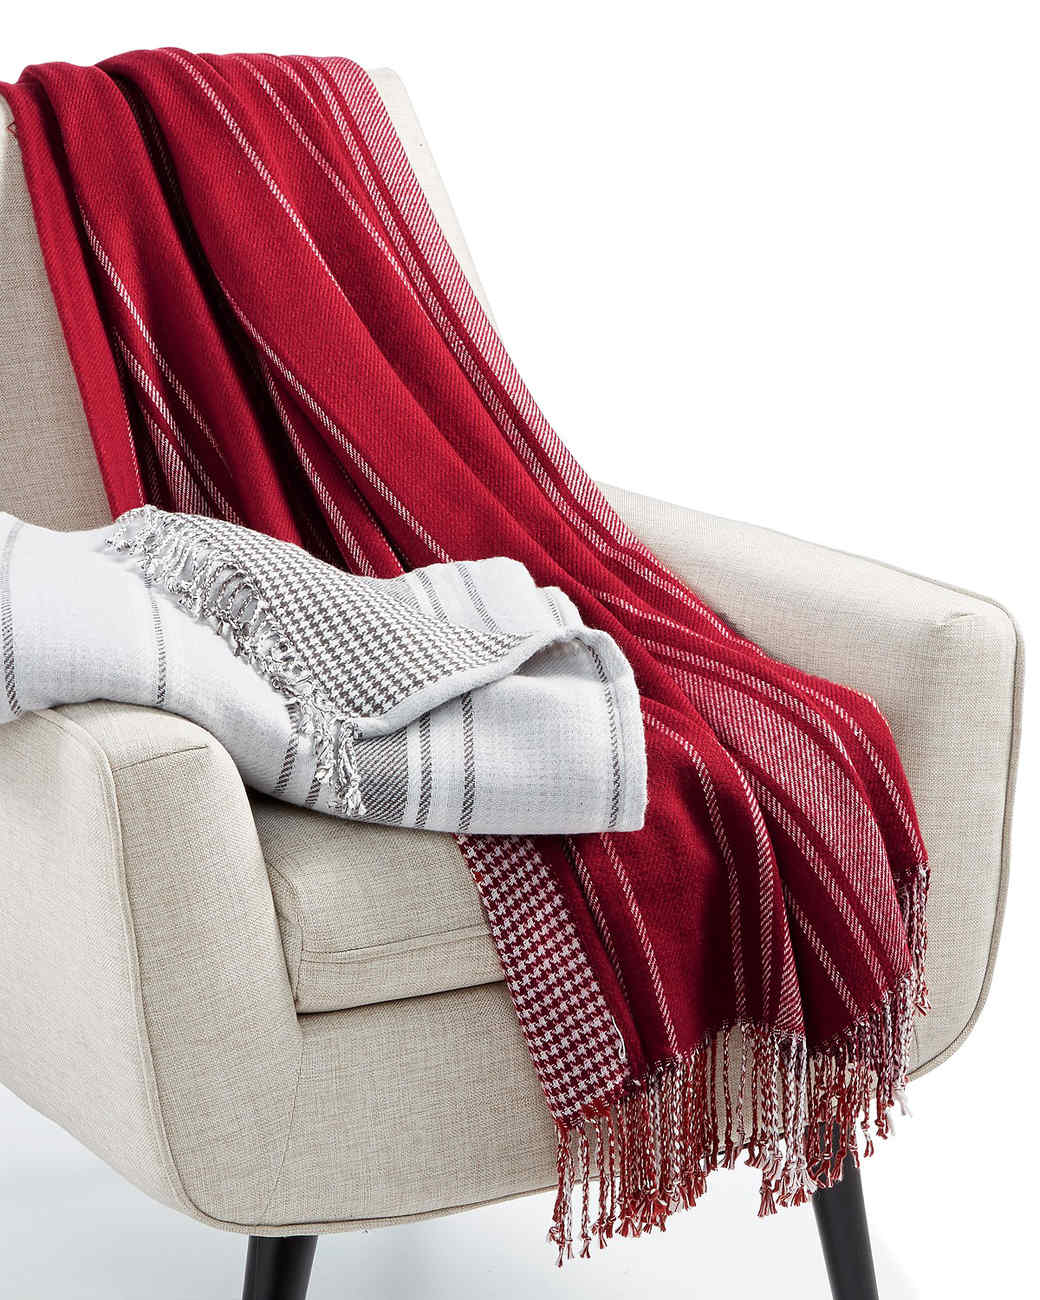 macys merch oversized red throw blanket and white throw blanket